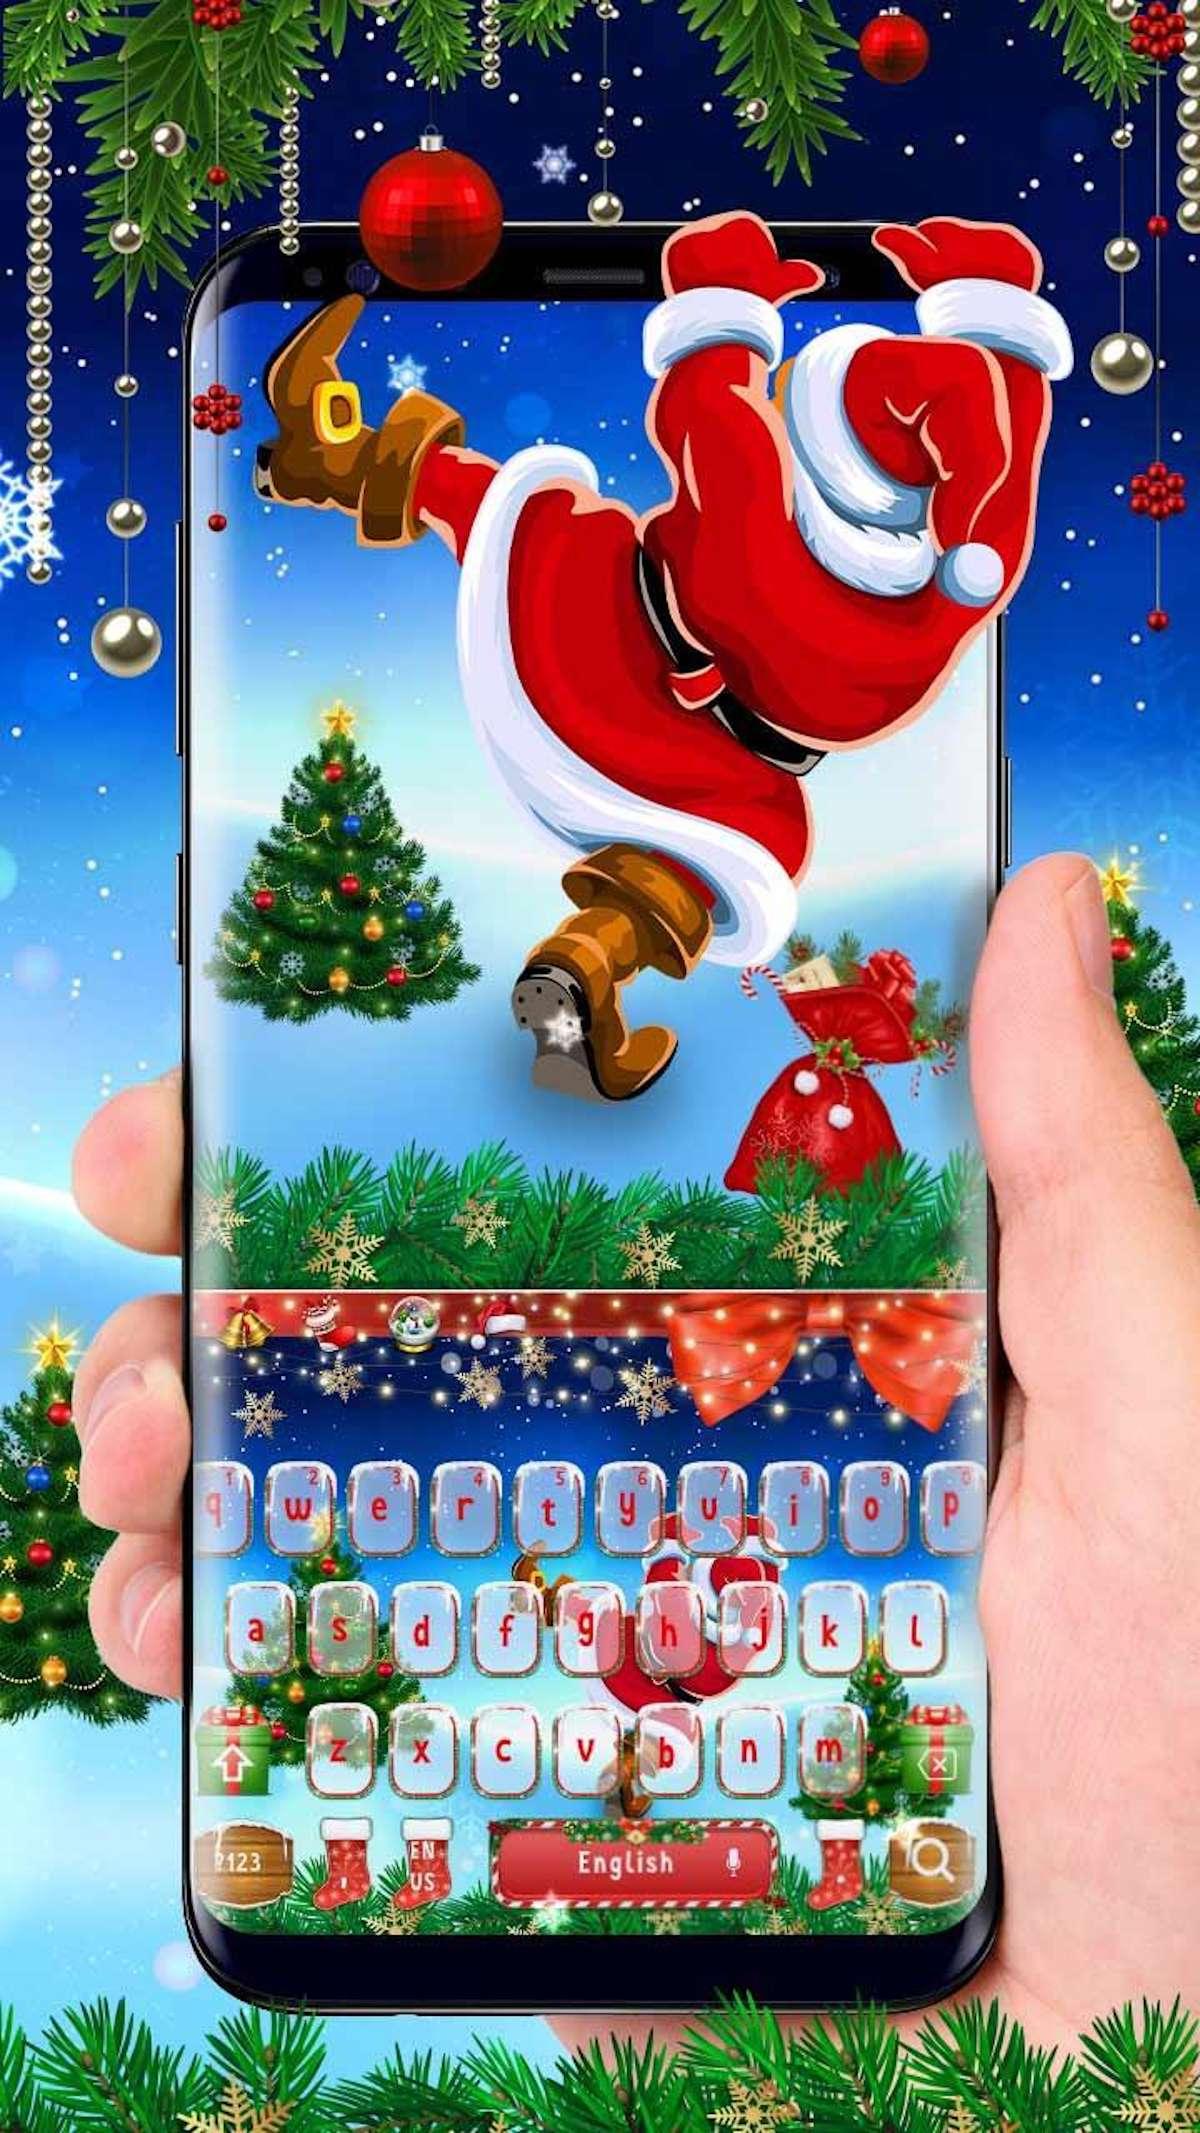 Los mejores temas navideños para tu móvil 8